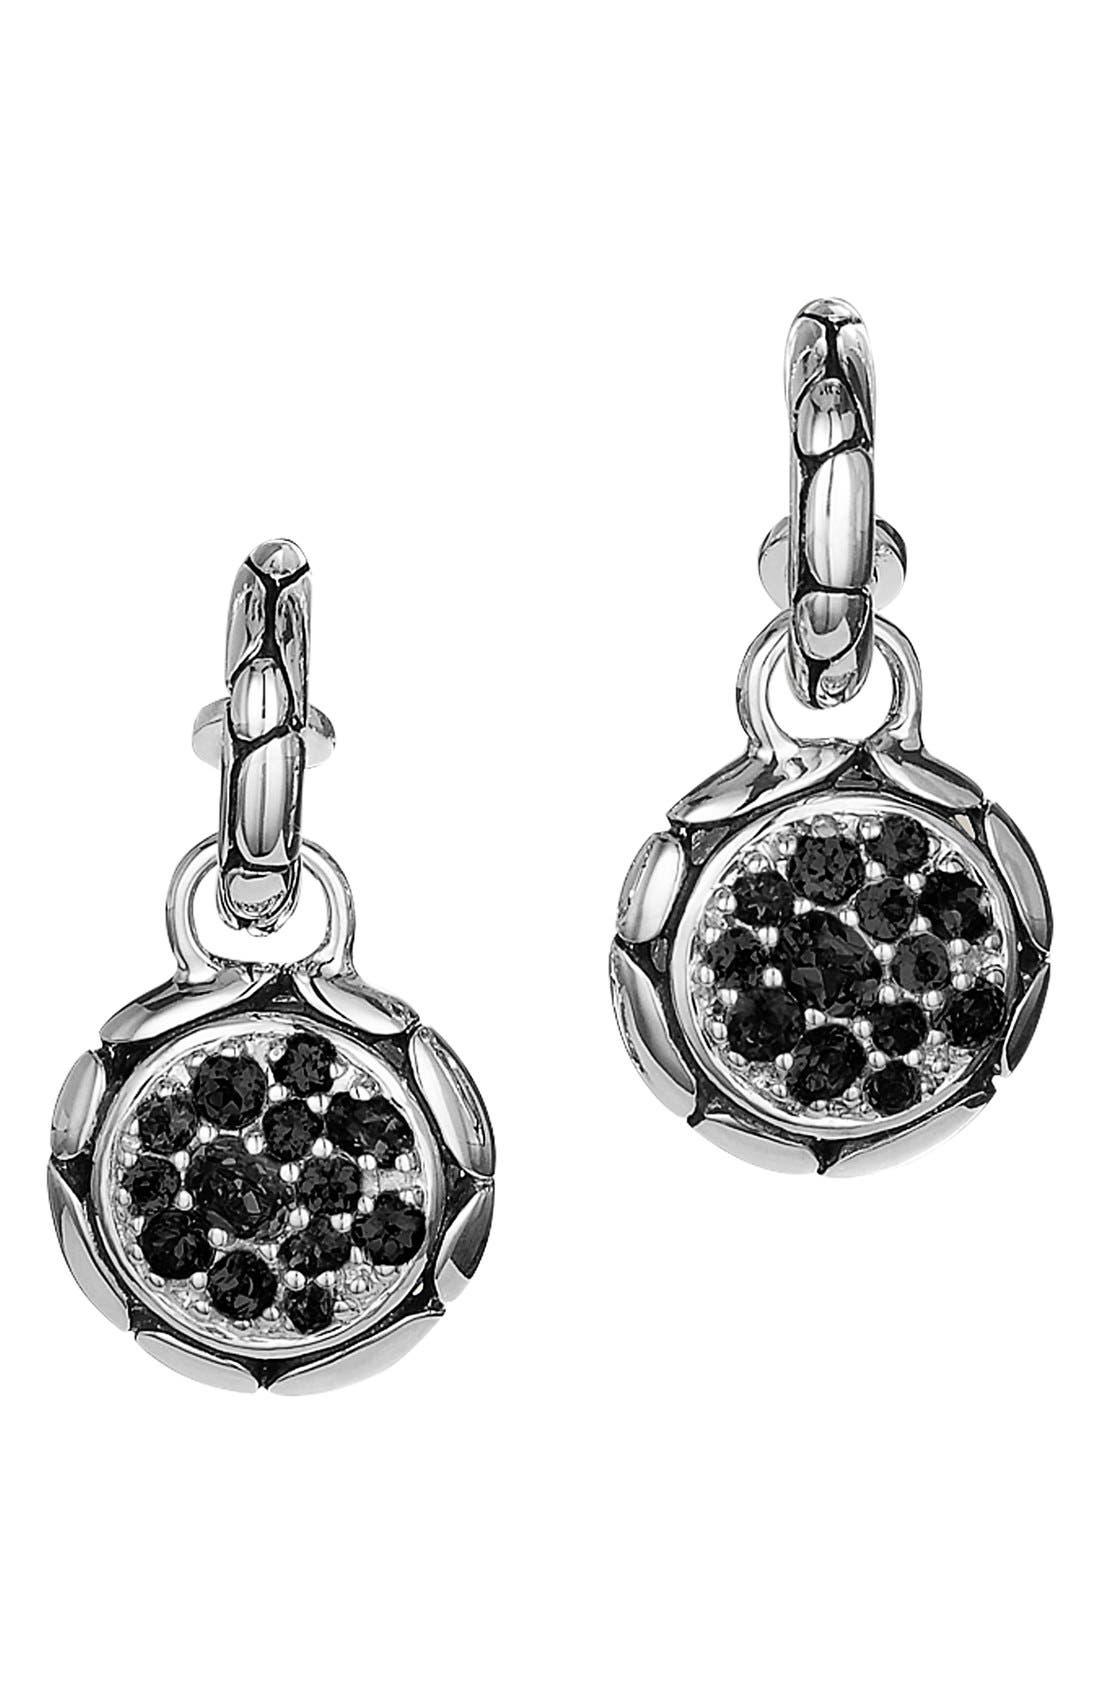 'Kali' Black Sapphire Drop Earrings,                         Main,                         color, Silver/ Black Sapphire